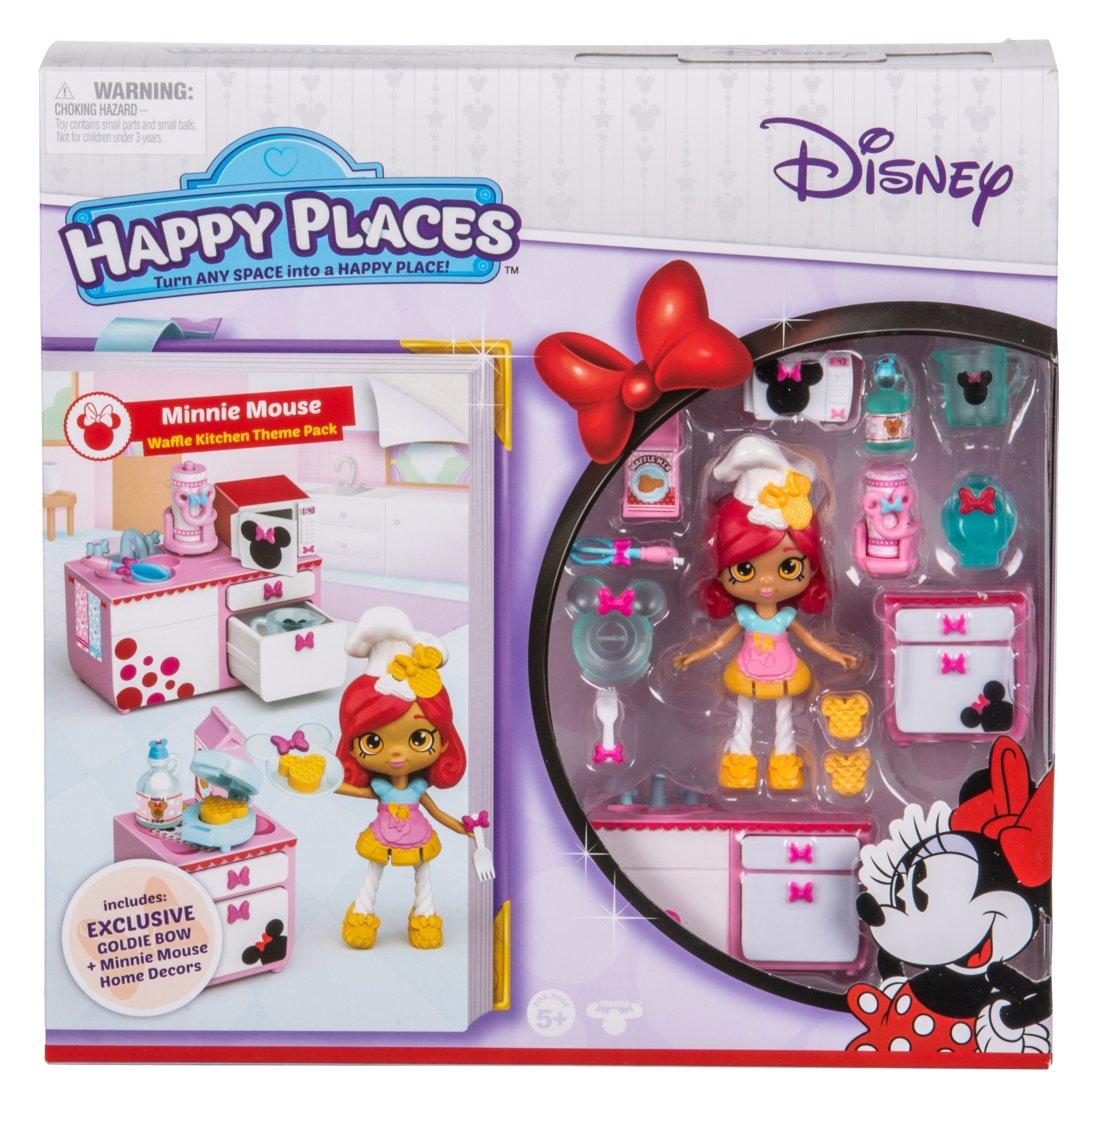 Happy Places Disney Season 1 Minnie Mouse Waffle Kitchen Theme Pack Moose Toys Import 58109